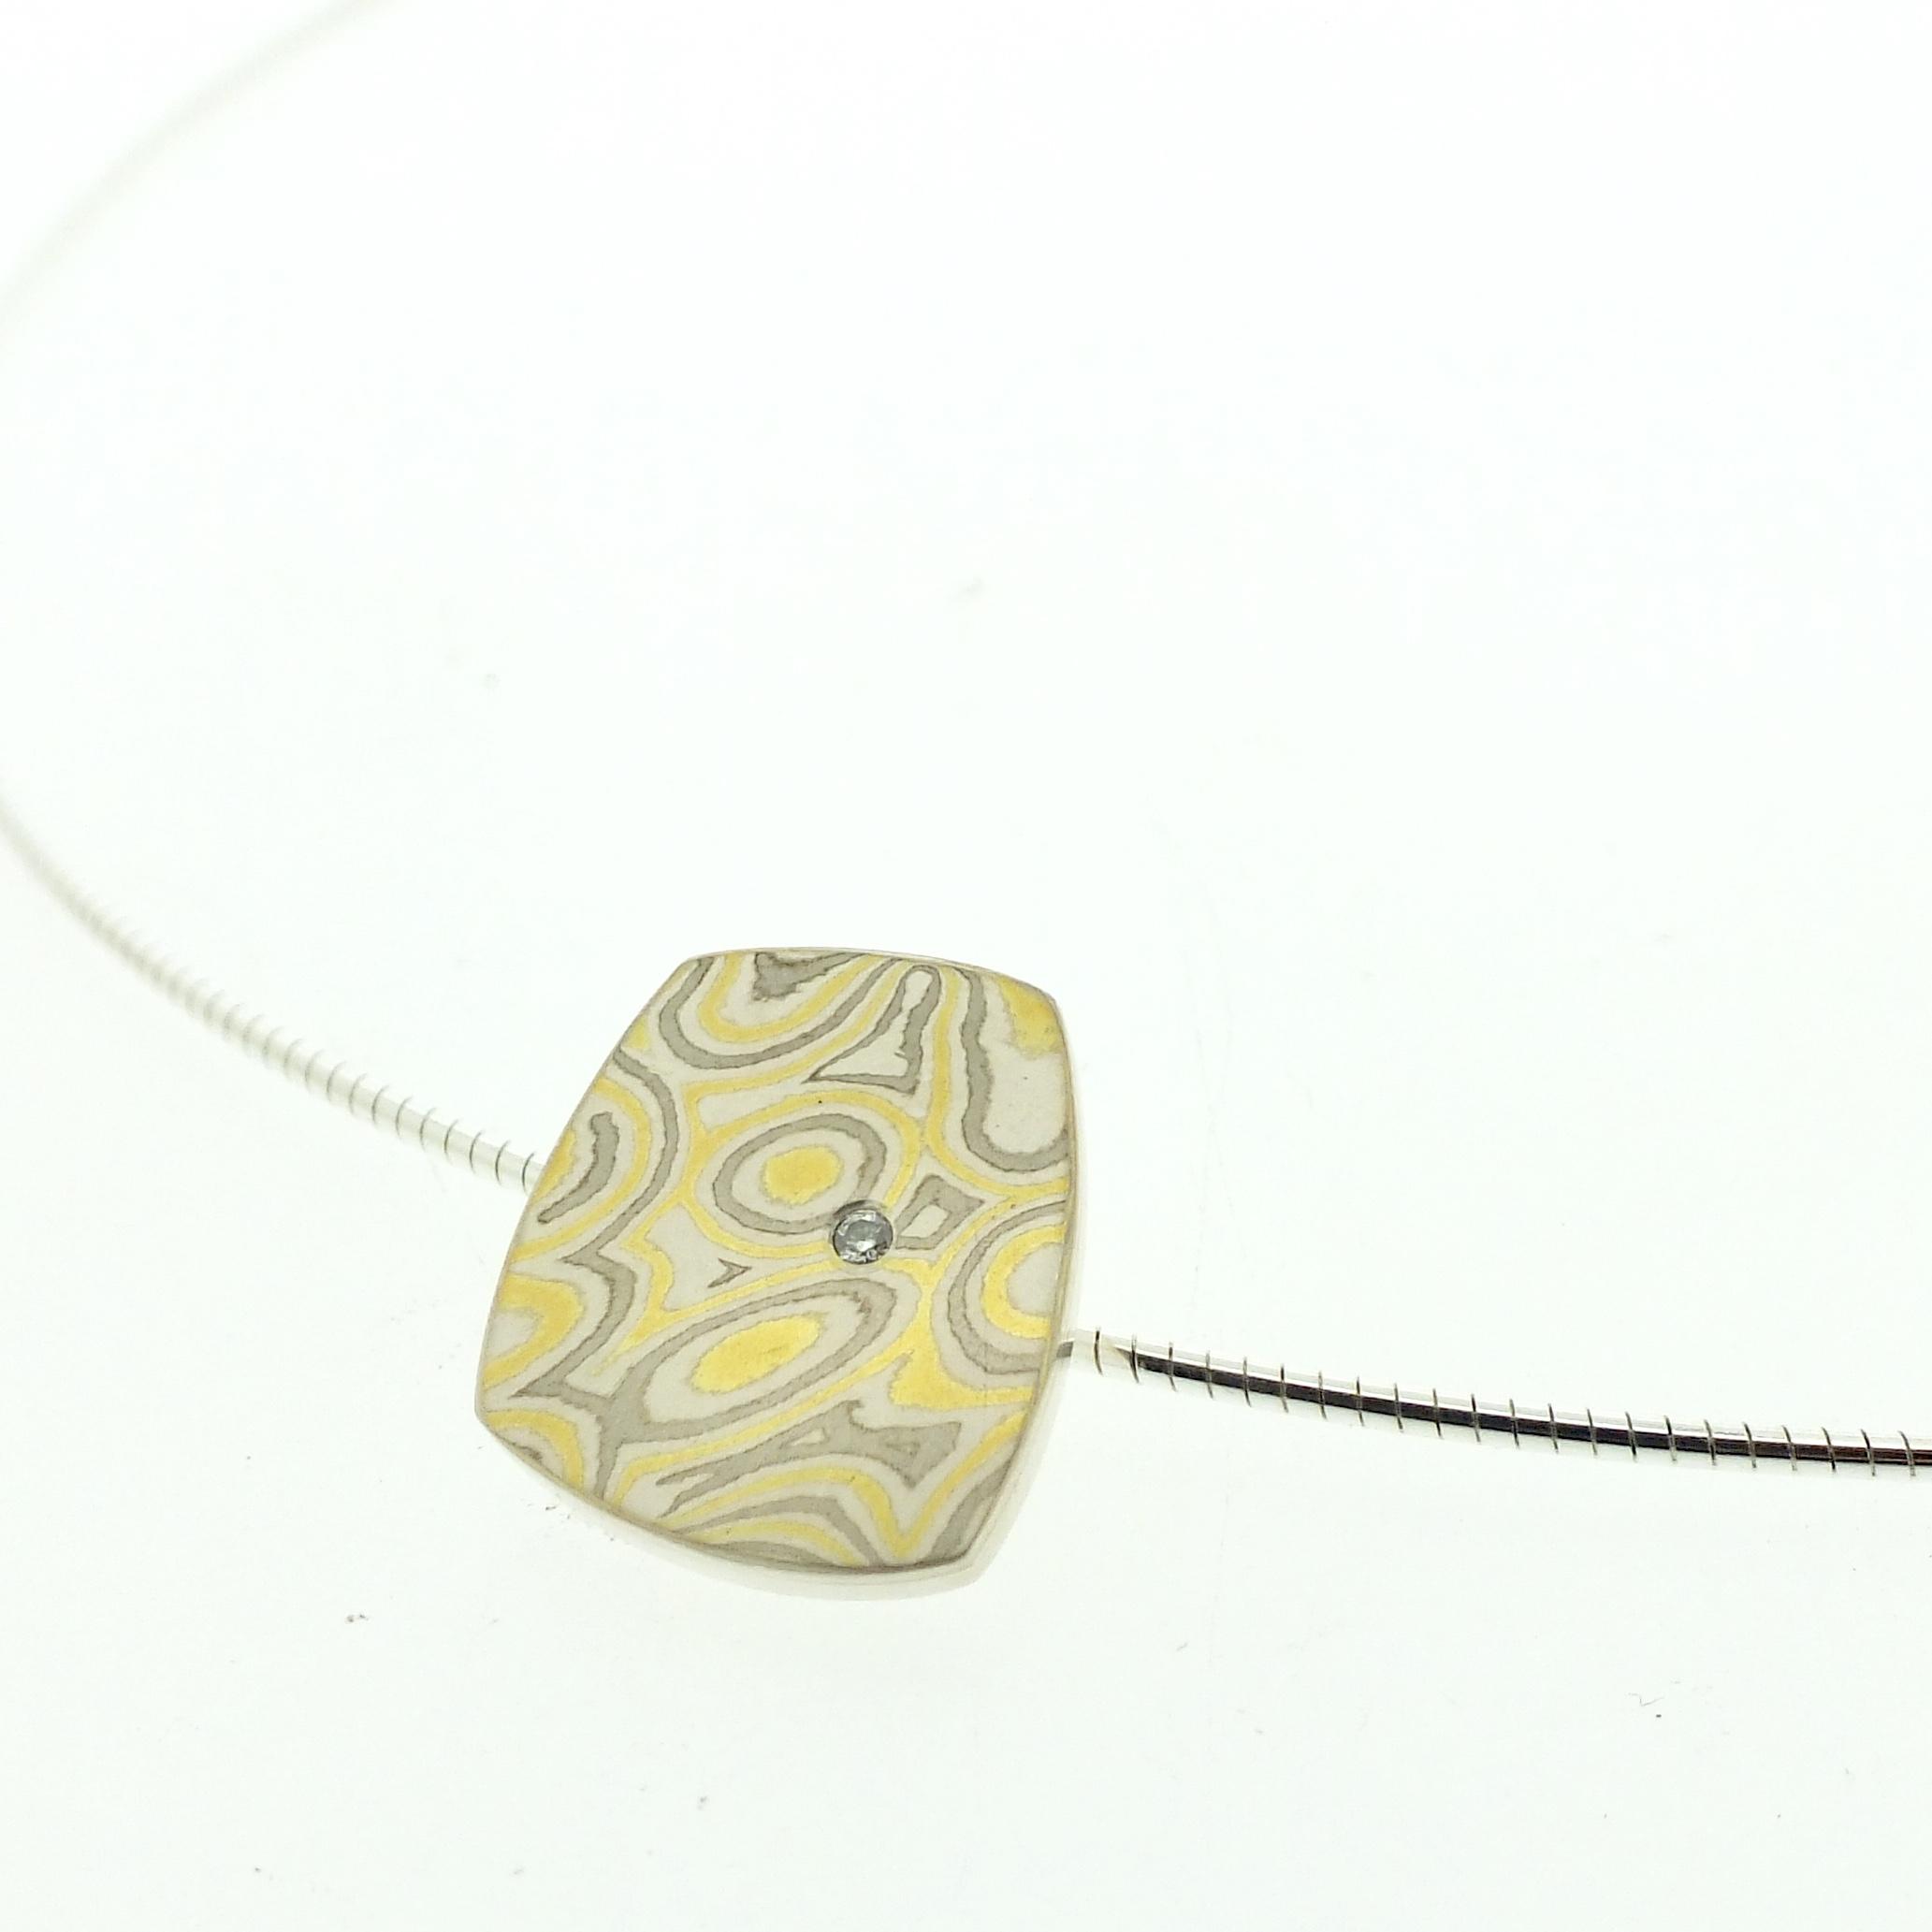 22k gold, 18k white gold and silver mokume gane small Fower Neukit pendant with diamond detail